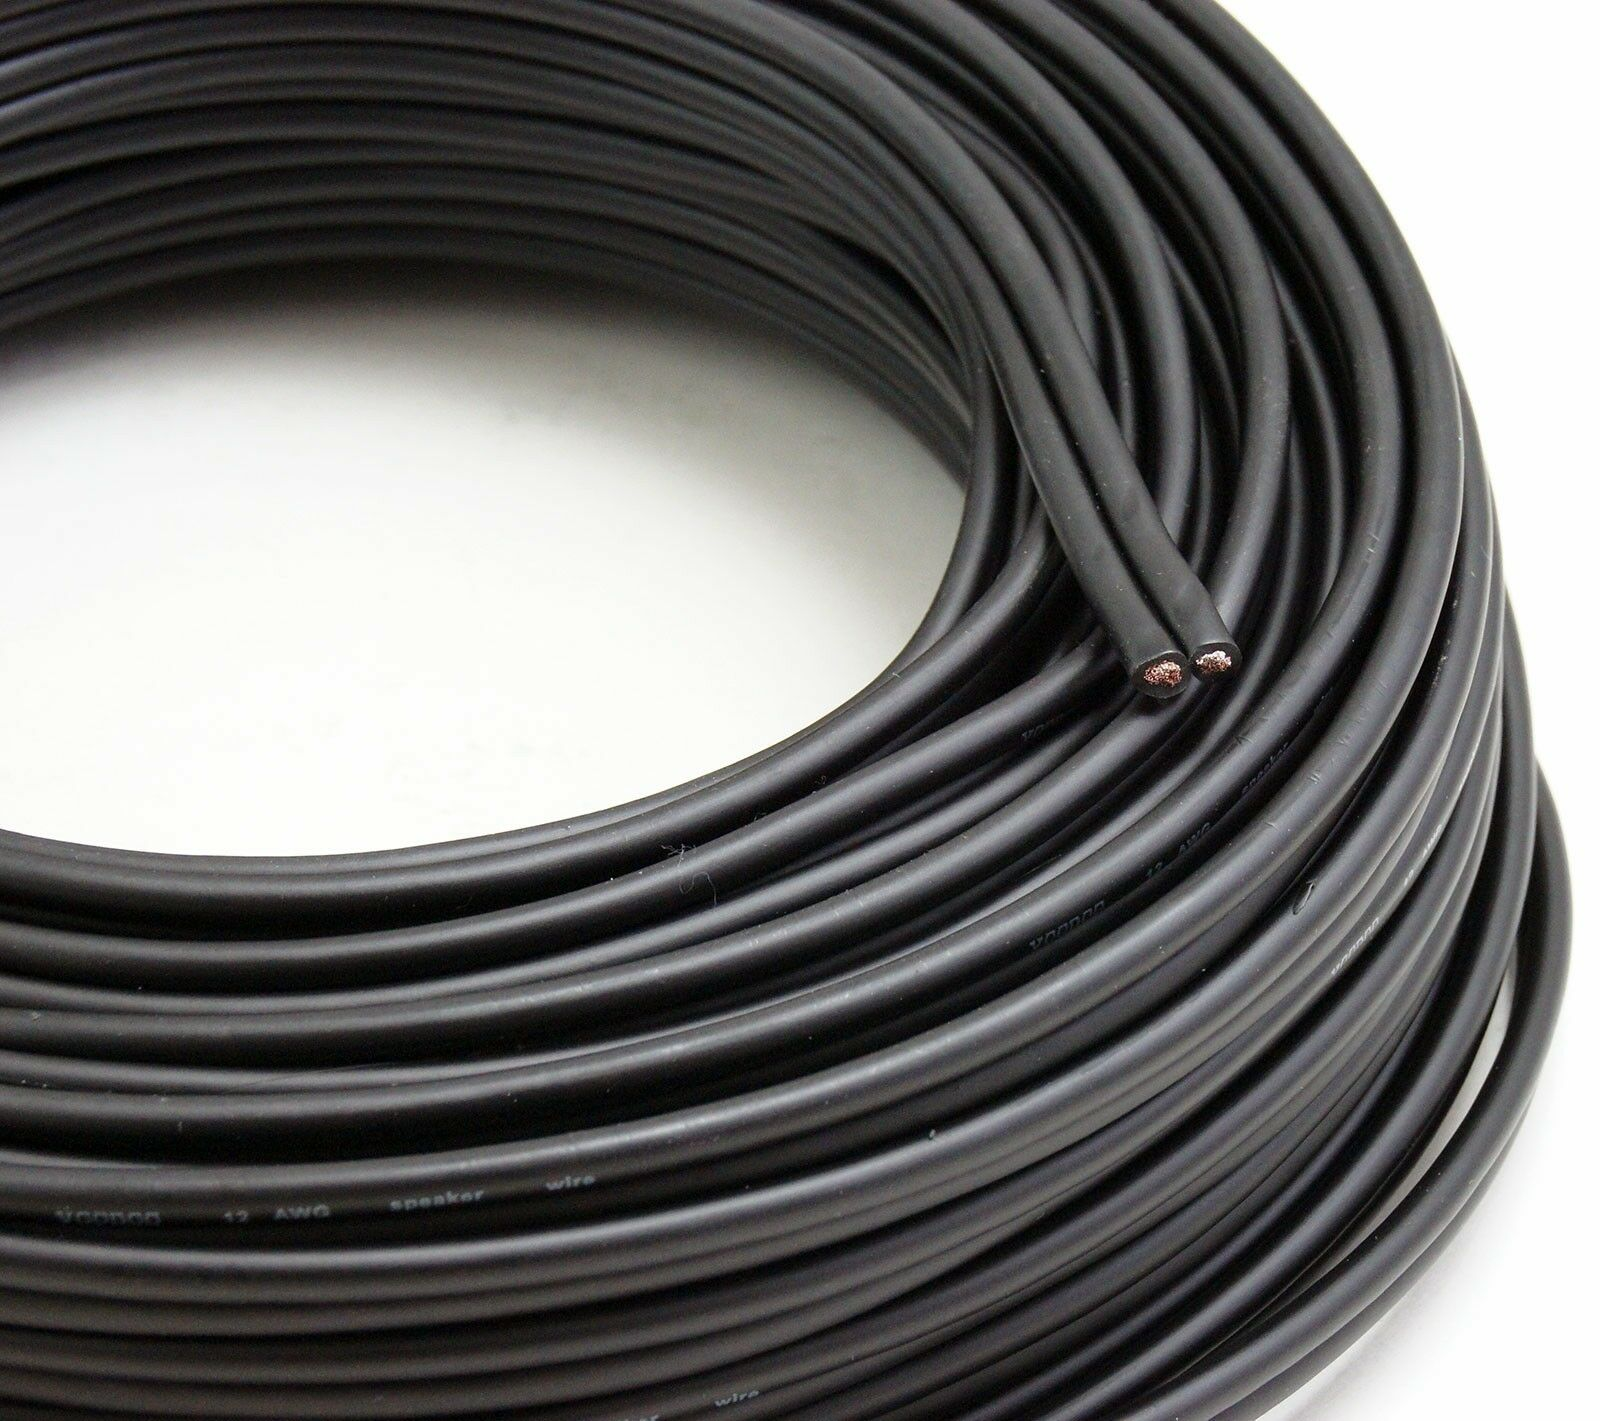 voodoo black speaker wire 16 gauge true awg true spec 100ft home car audio ebay. Black Bedroom Furniture Sets. Home Design Ideas